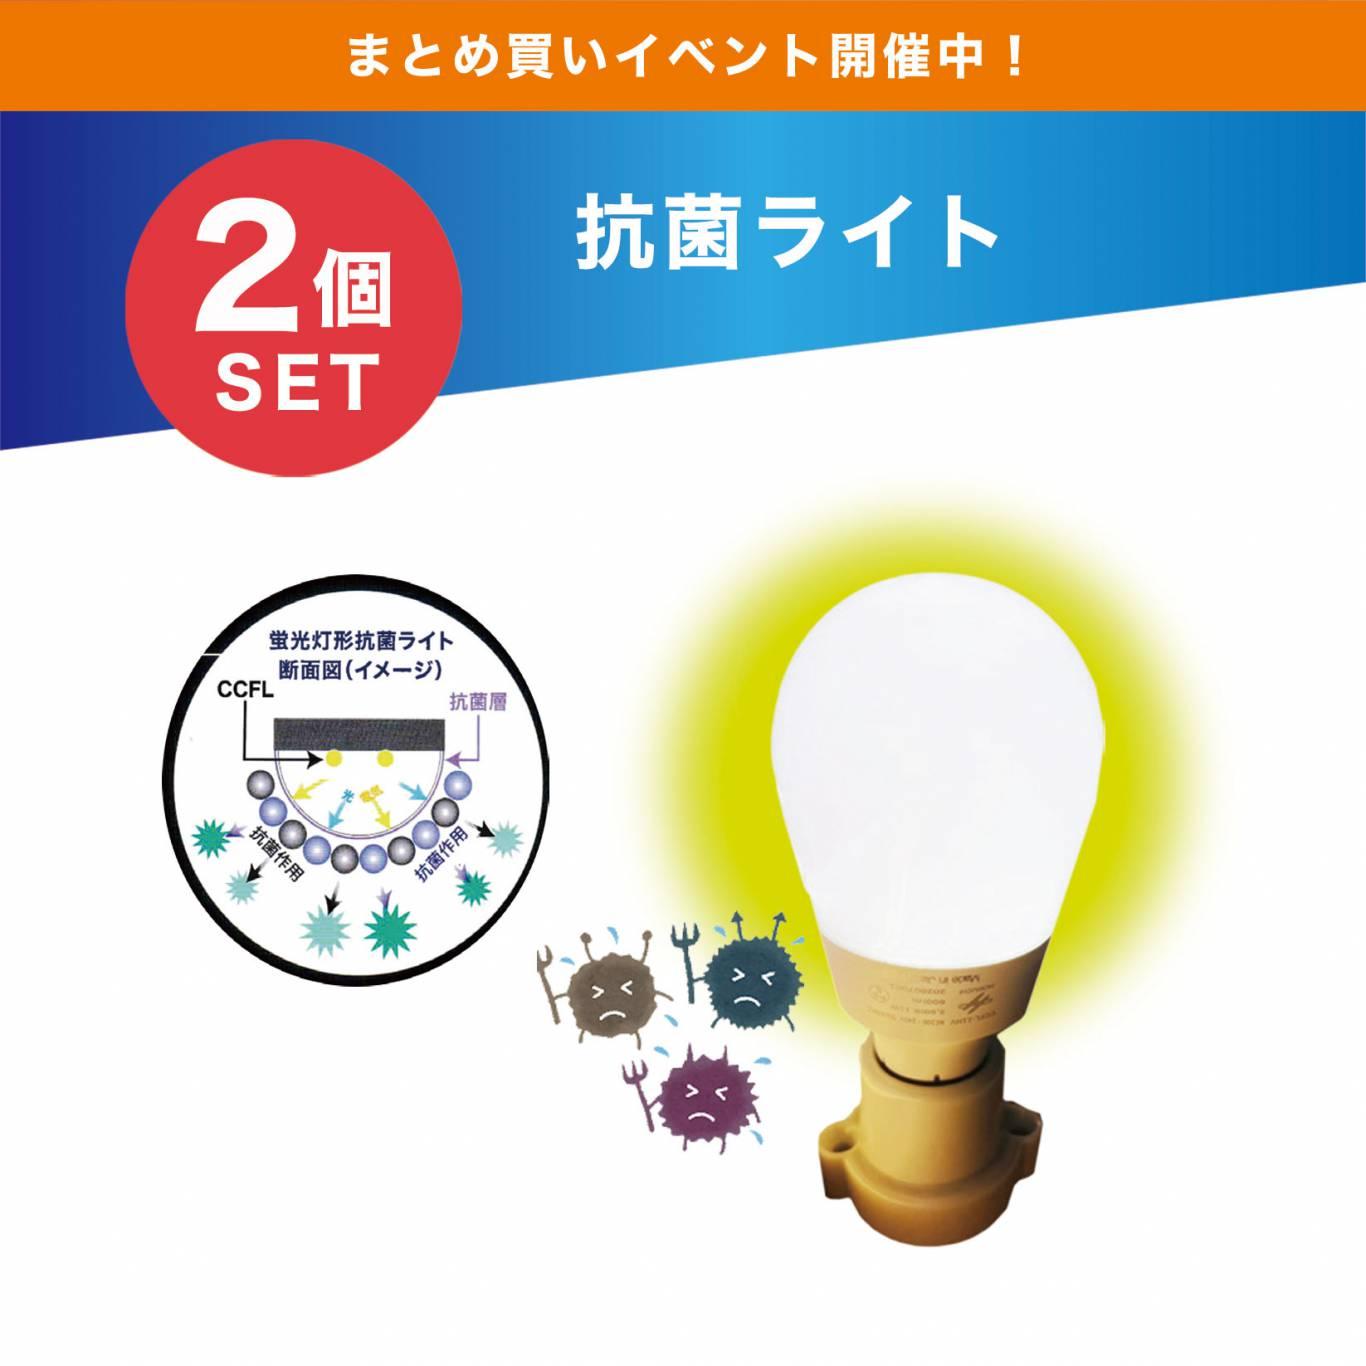 【EVENT】安心生活! CCFL抗菌ライト 2個まとめ買い(20,000円⇒17,000円 3,000円お得!激安)